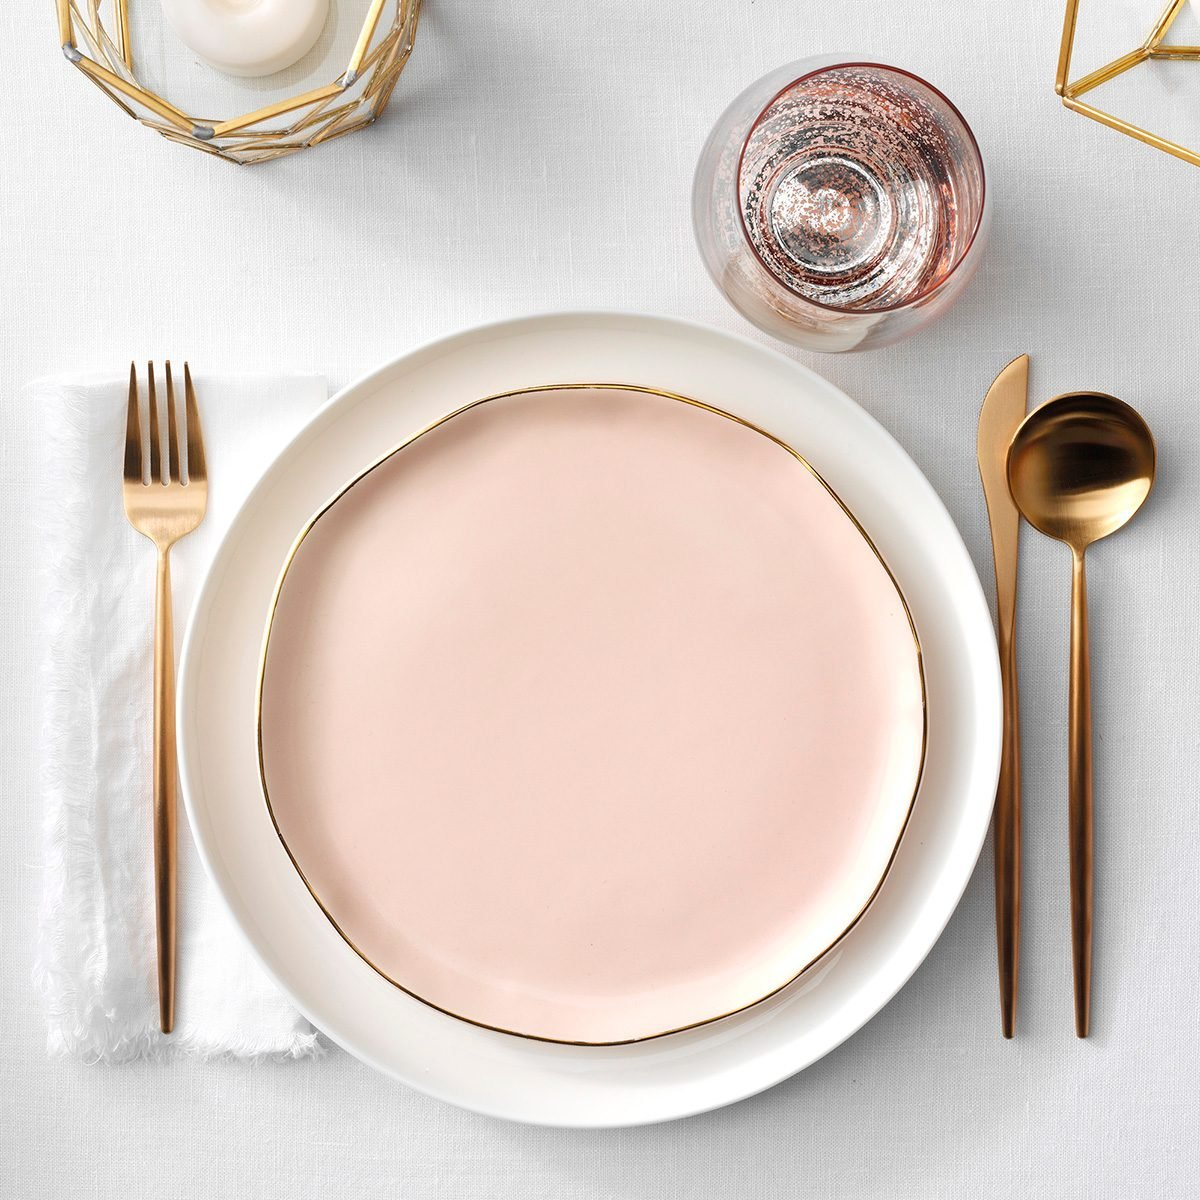 Simply Beautiful Plates